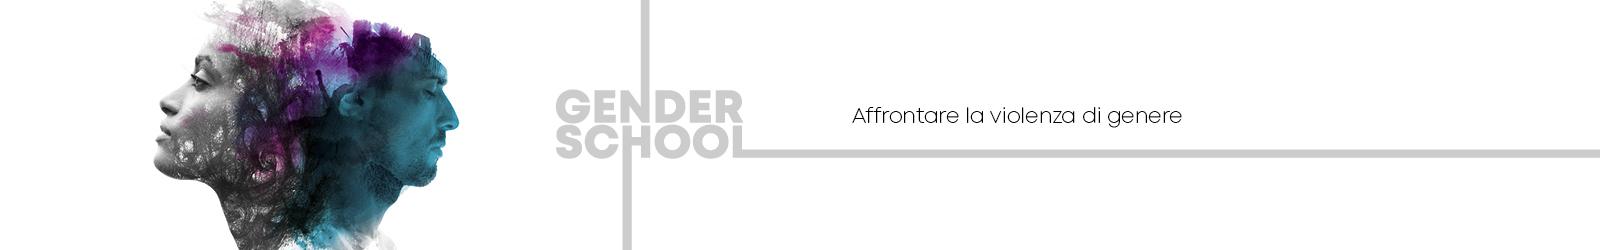 Gender School, affrontare la violenza di genere